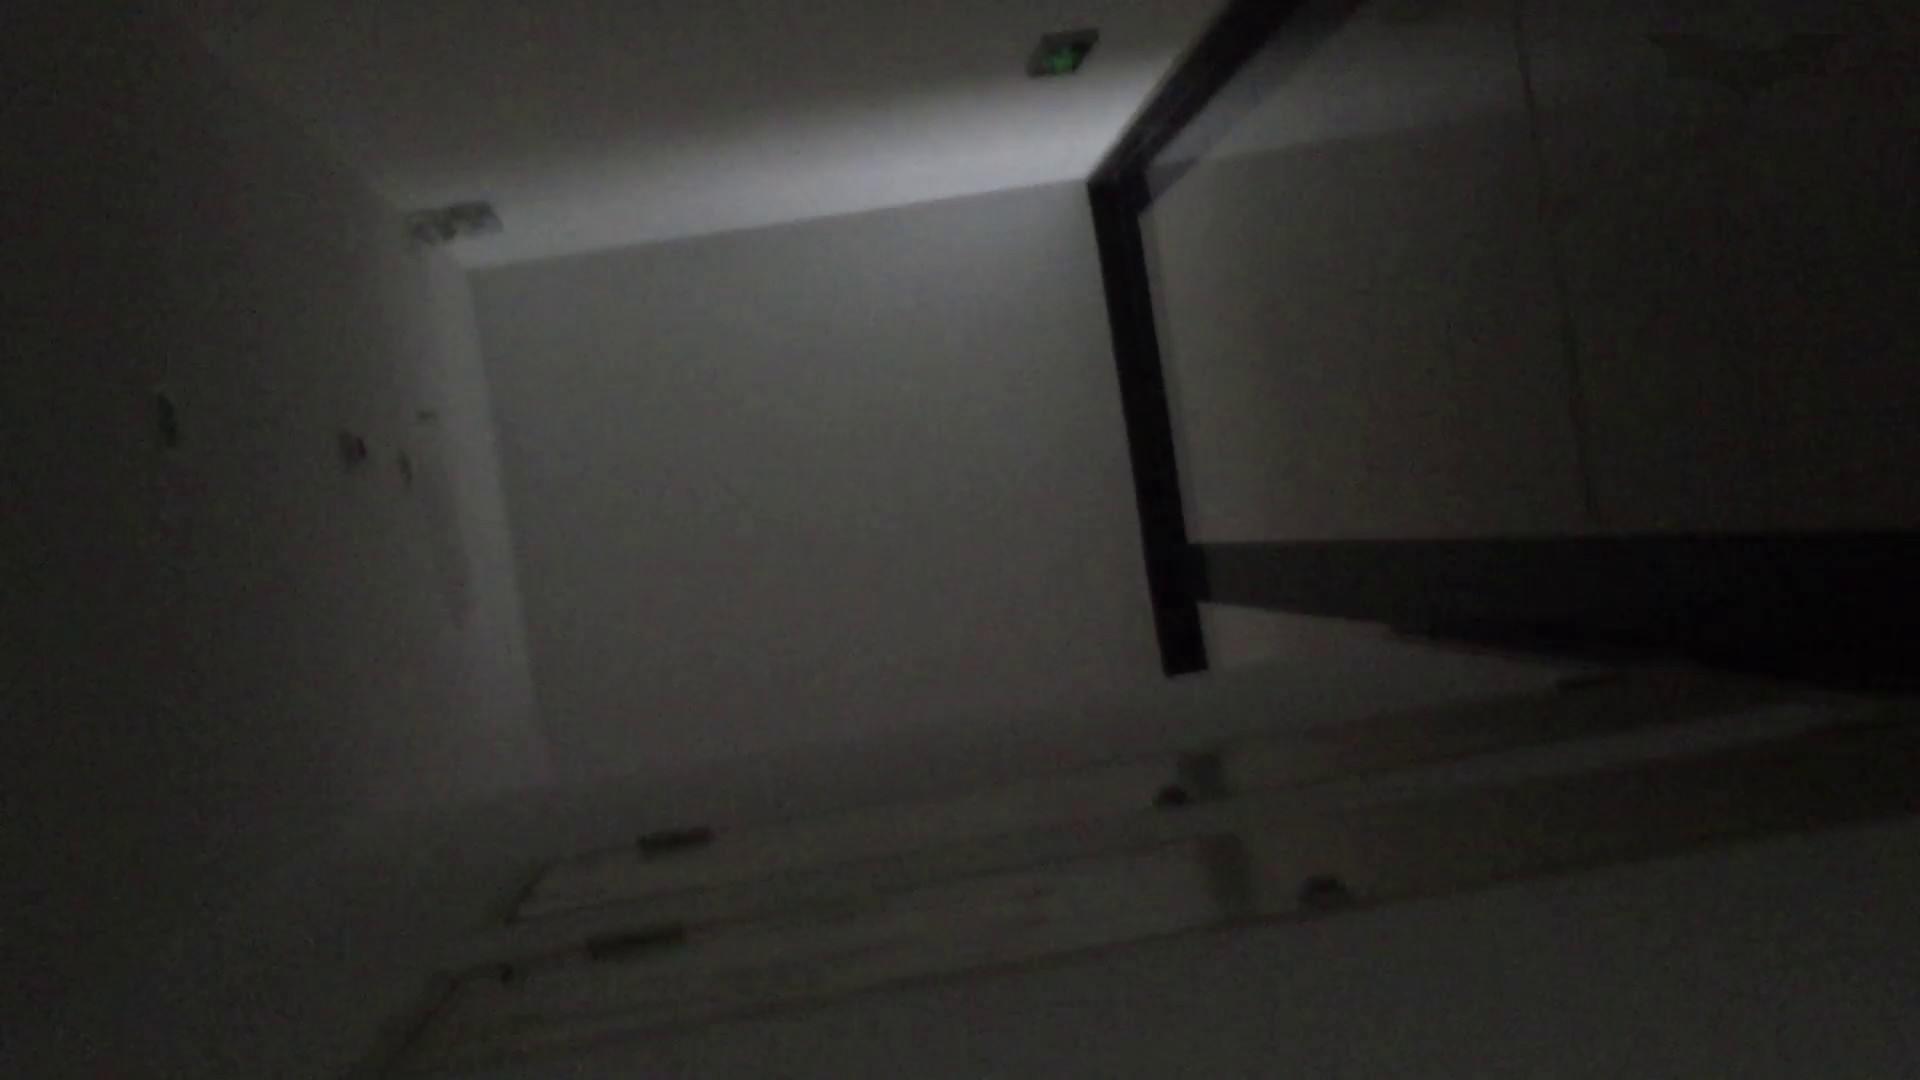 JD盗撮 美女の洗面所の秘密 Vol.74 美肌 オマンコ動画キャプチャ 109画像 45